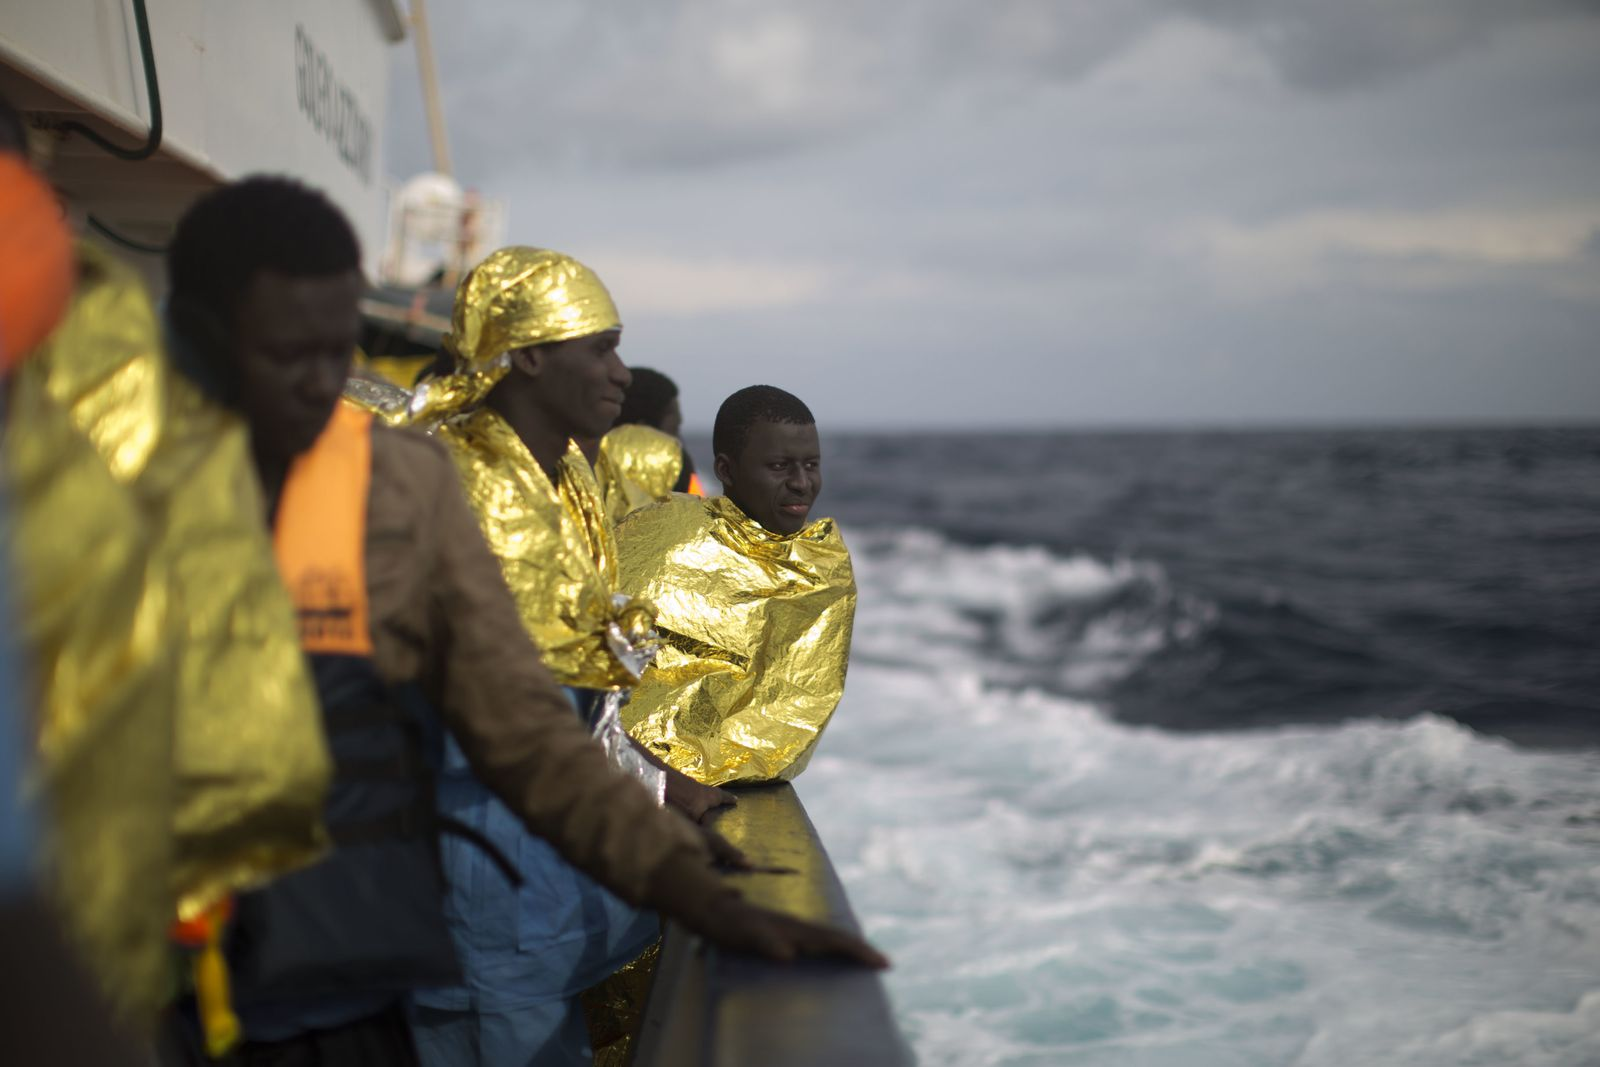 Libyen / Flüchtlinge